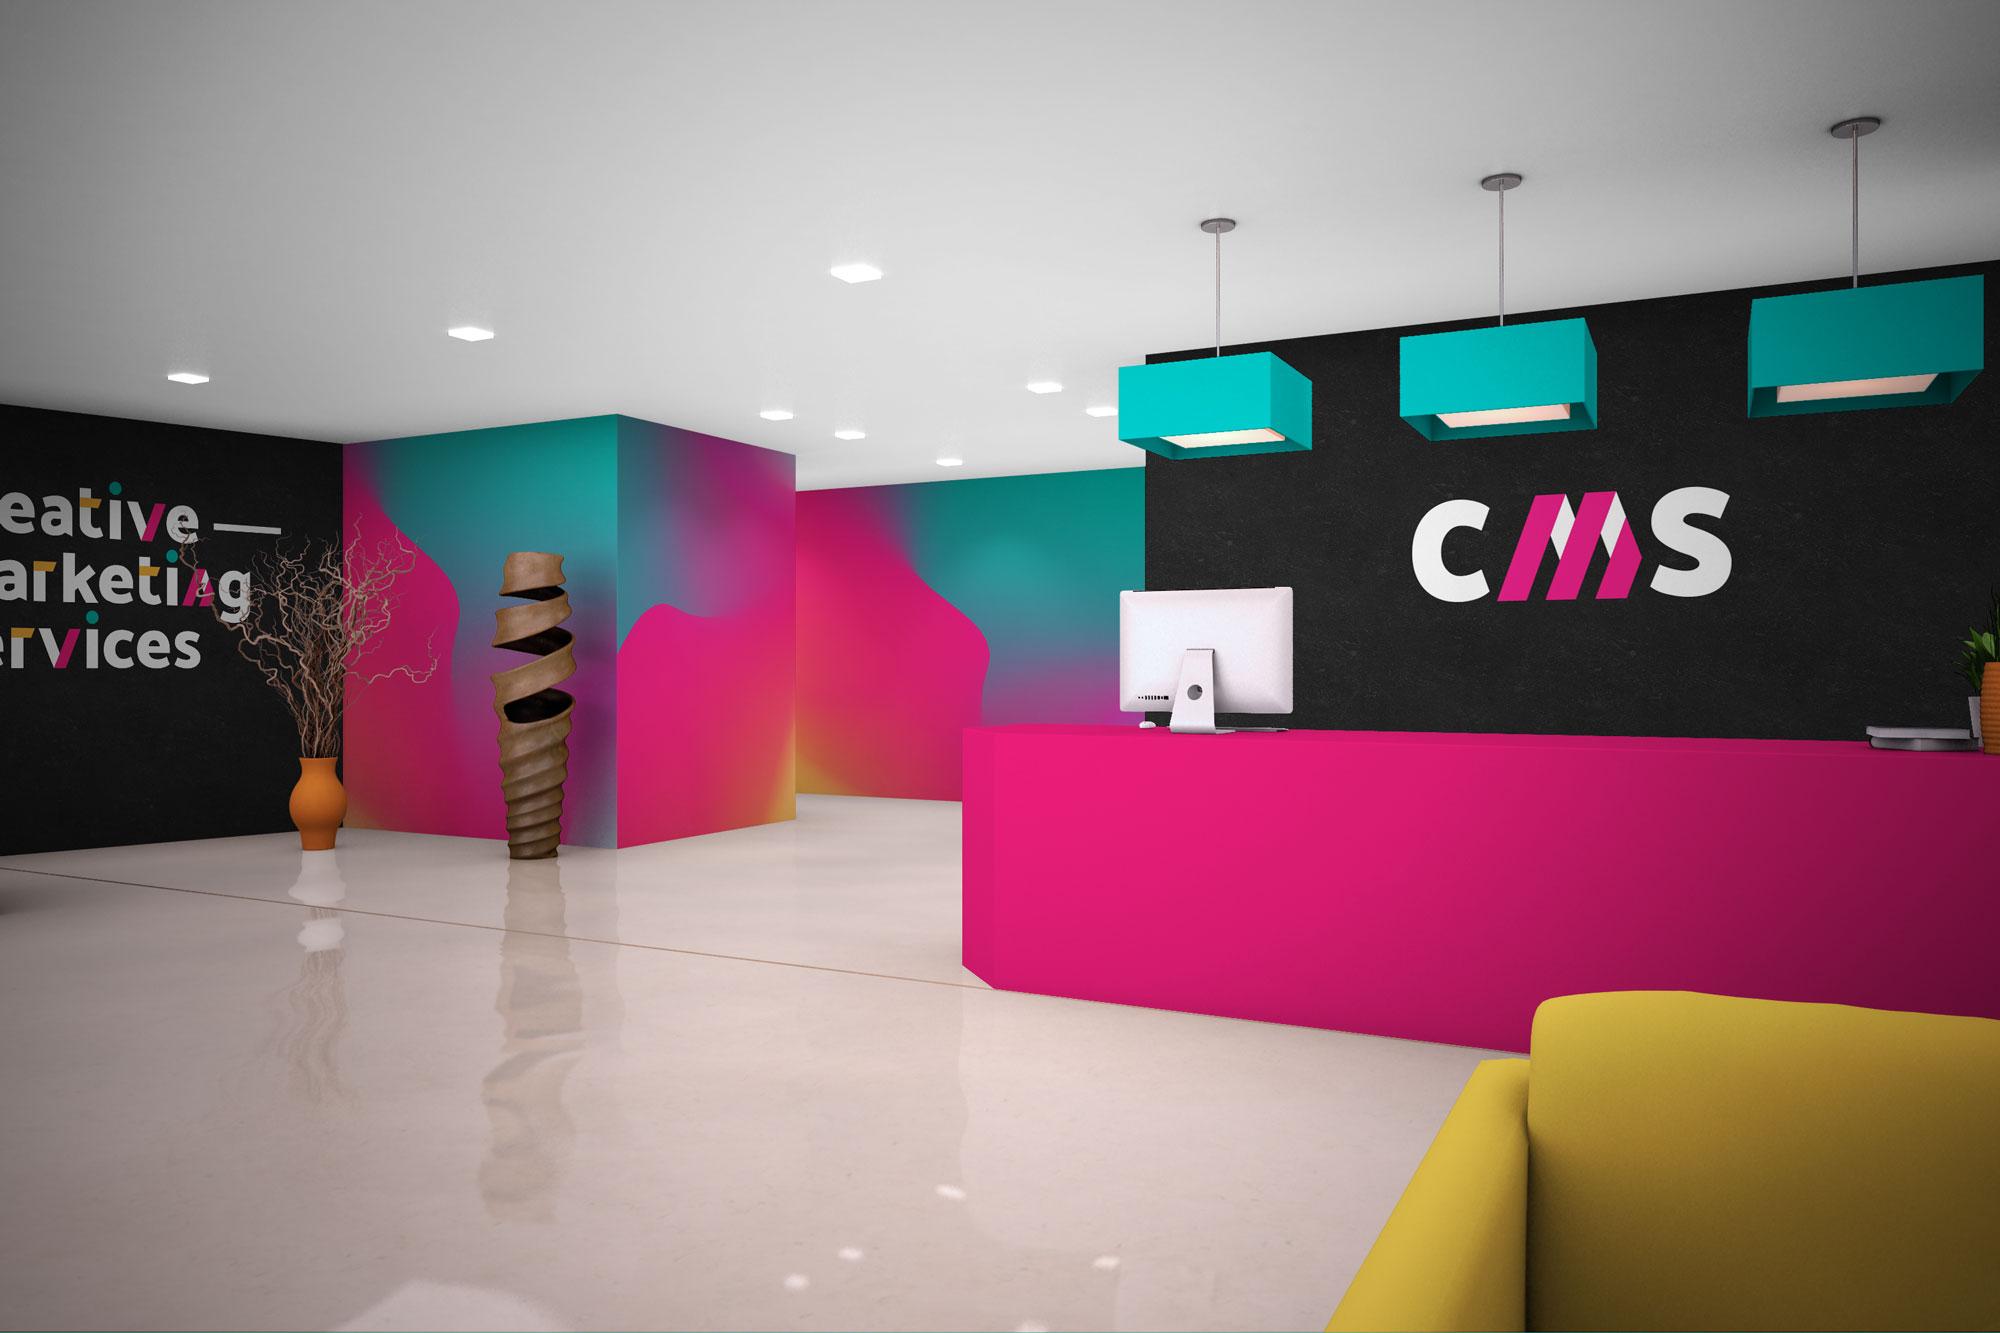 cms-space-01-by-yastudio